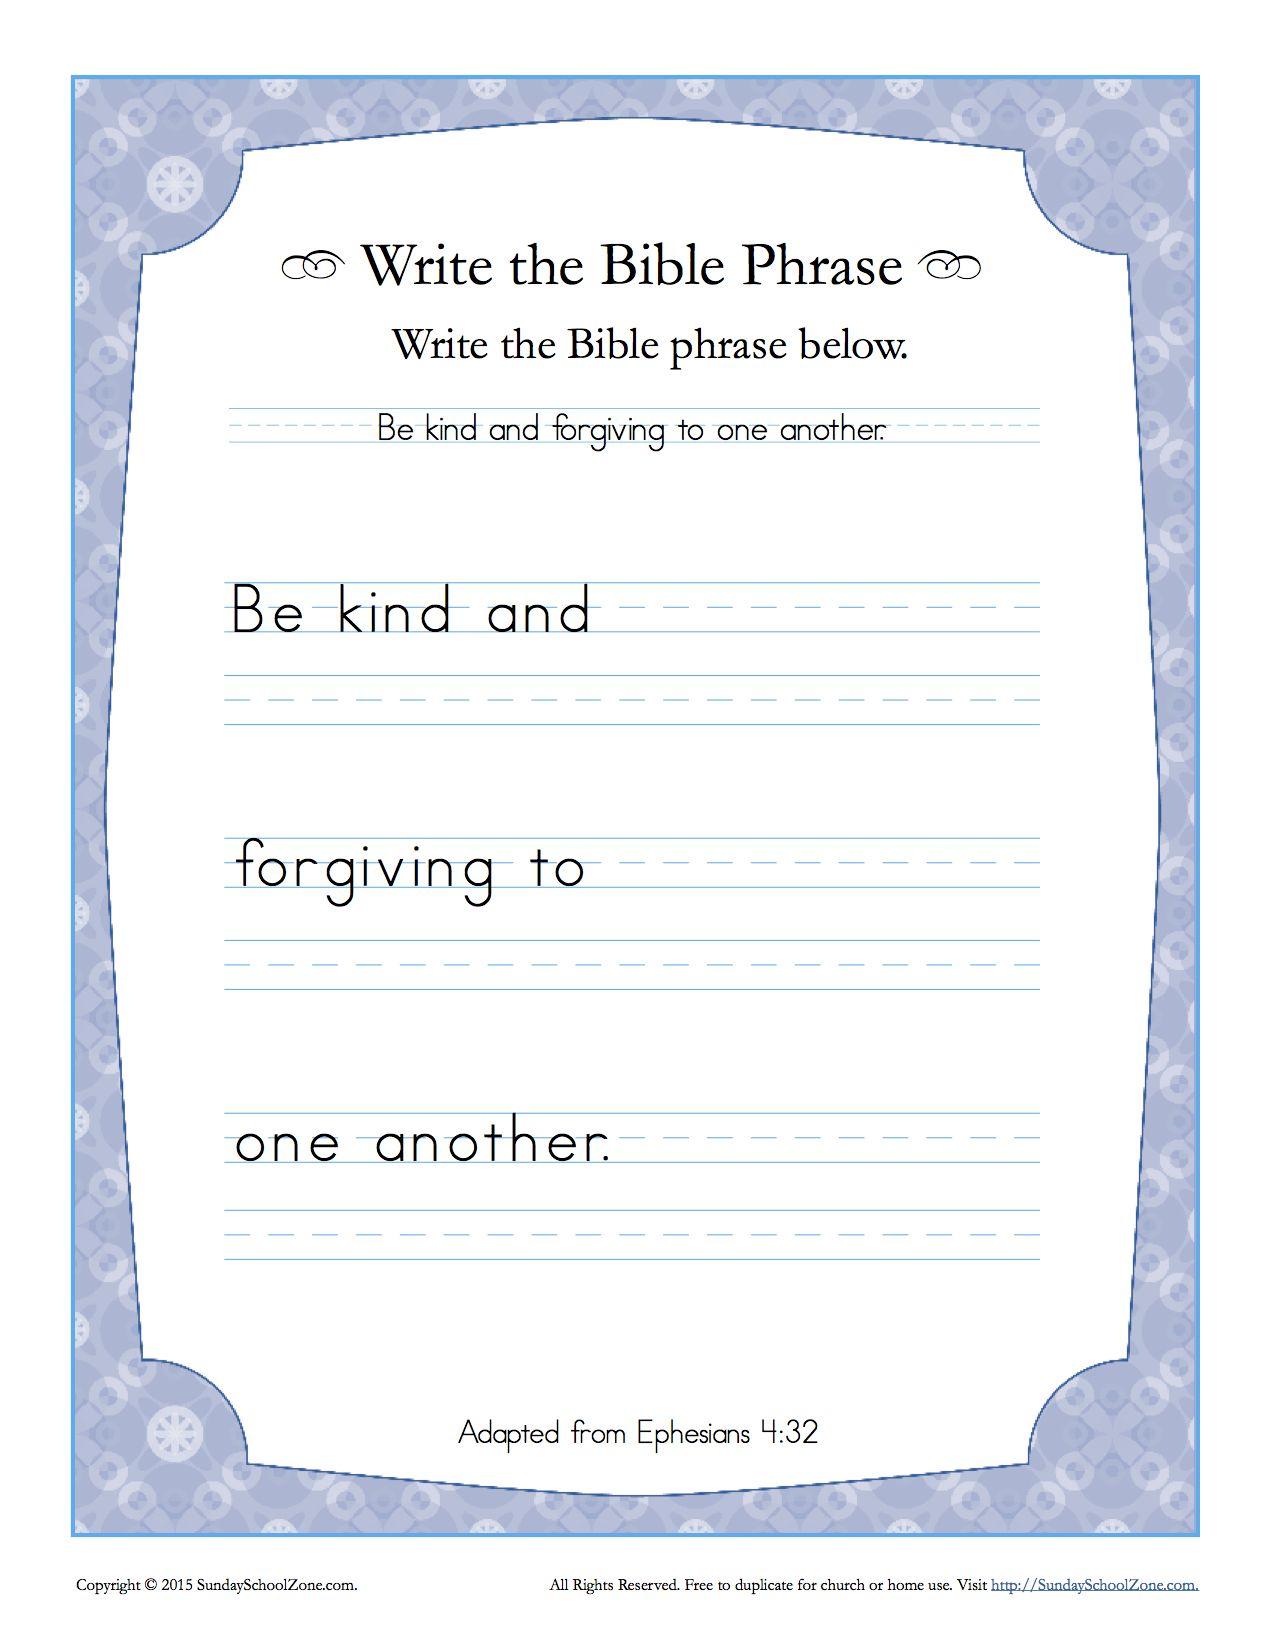 Ephesians 4 32 Write The Bible Phrase On Sunday School